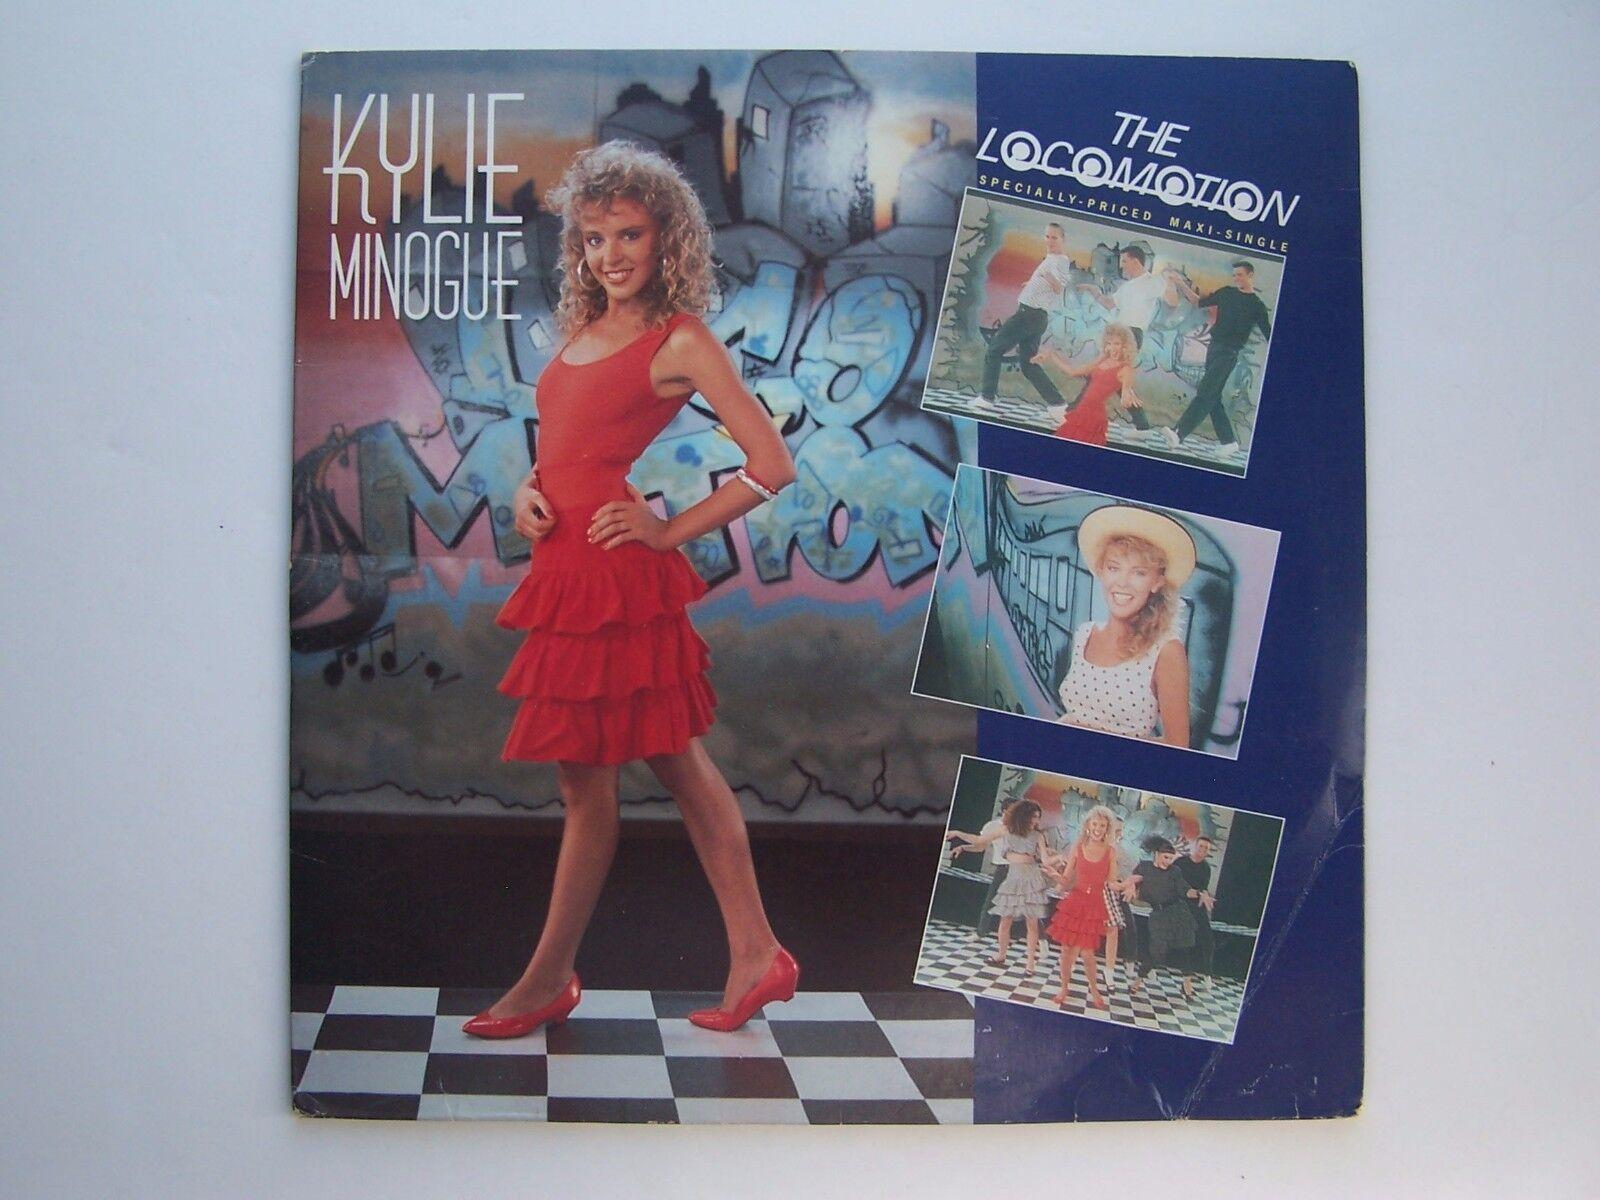 Kylie Minogue - The Loco-Motion Vinyl Single Record 0-2